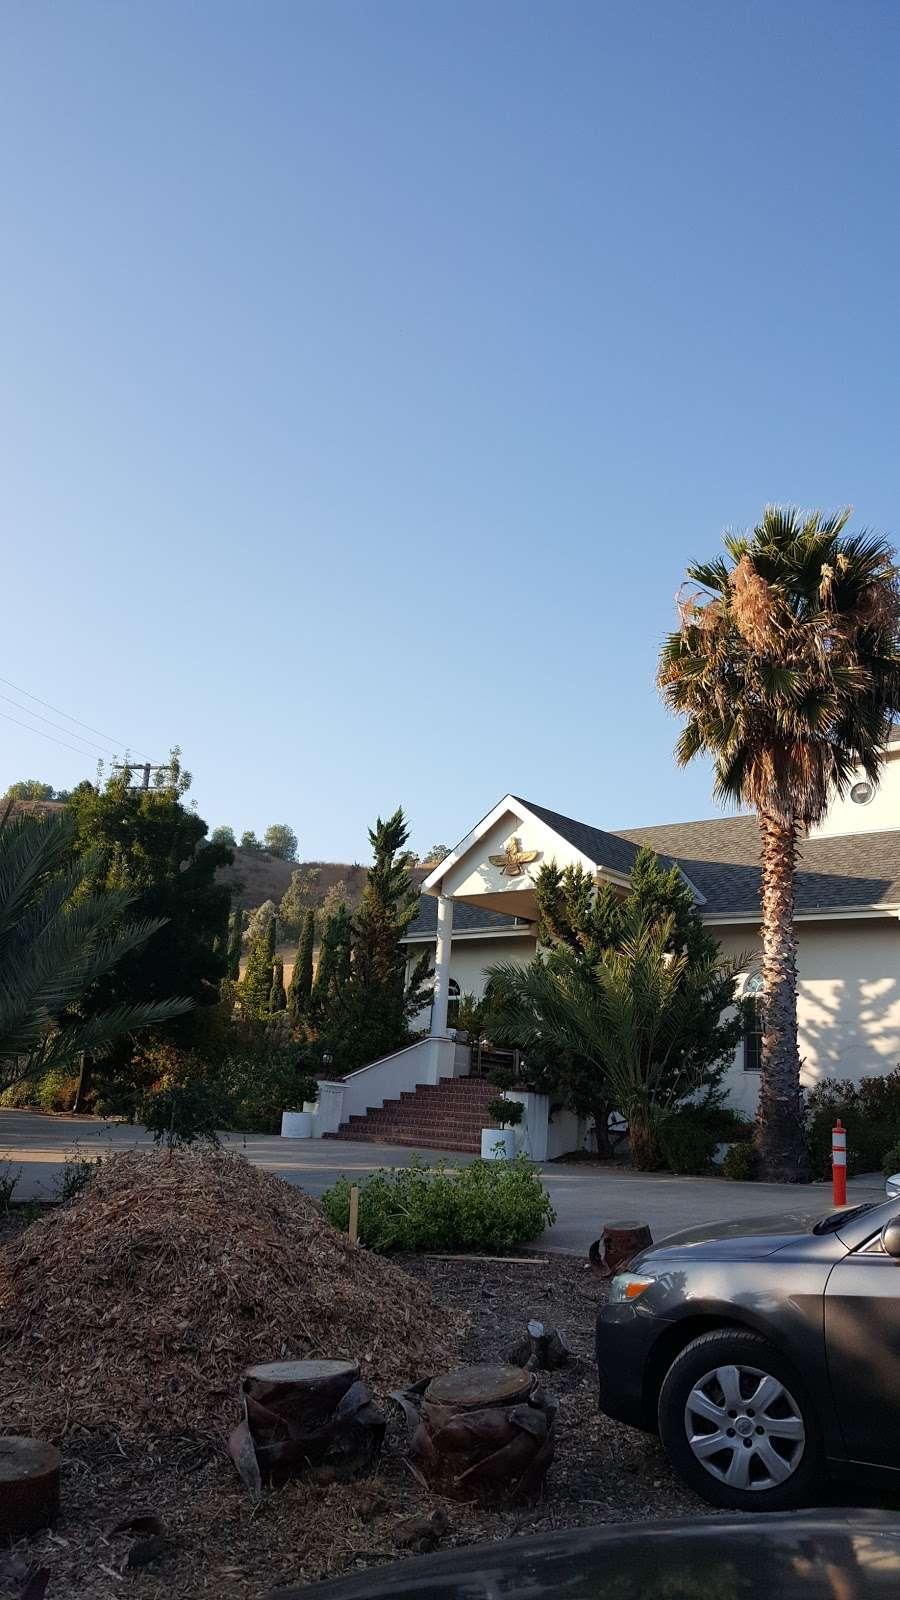 Zoroastrian Temple - church  | Photo 6 of 10 | Address: 10468 Crothers Rd, San Jose, CA 95127, USA | Phone: (408) 272-1678